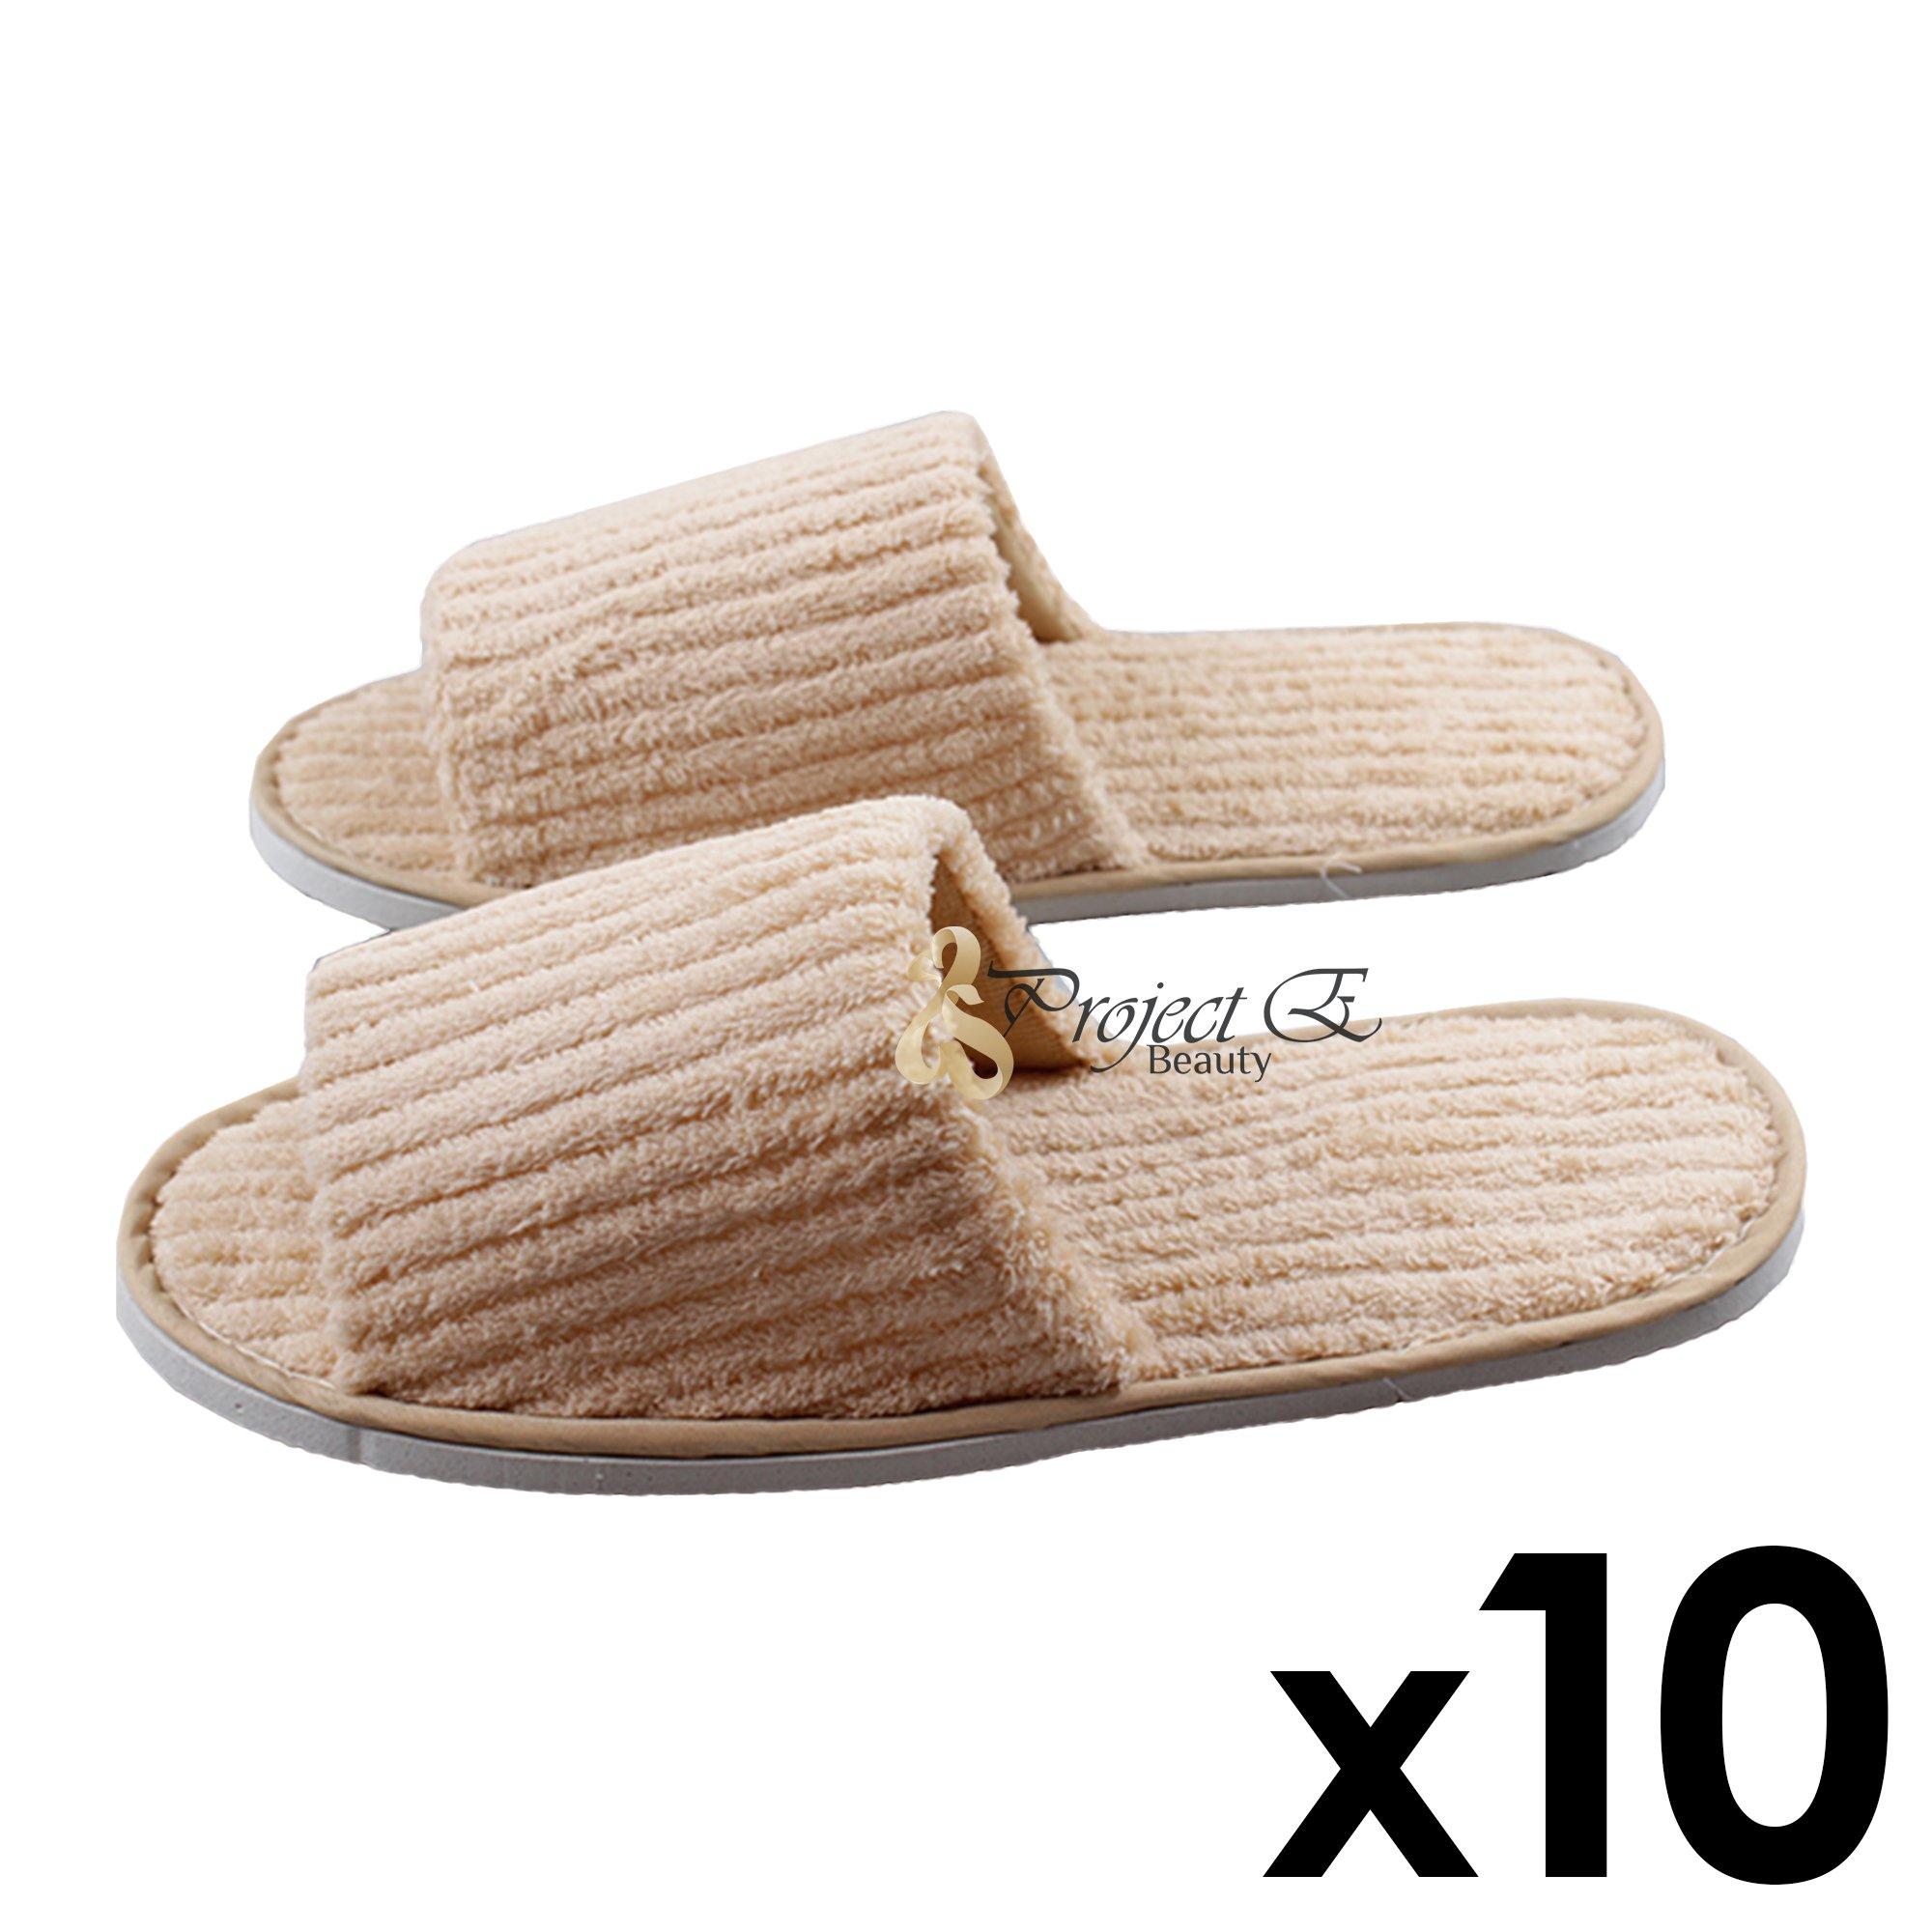 Coral Fleece Striped Slipper Non-Skid Home Salon Spa Hotel Open Toes Unisex Slippers - 10 Pairs - Khaki